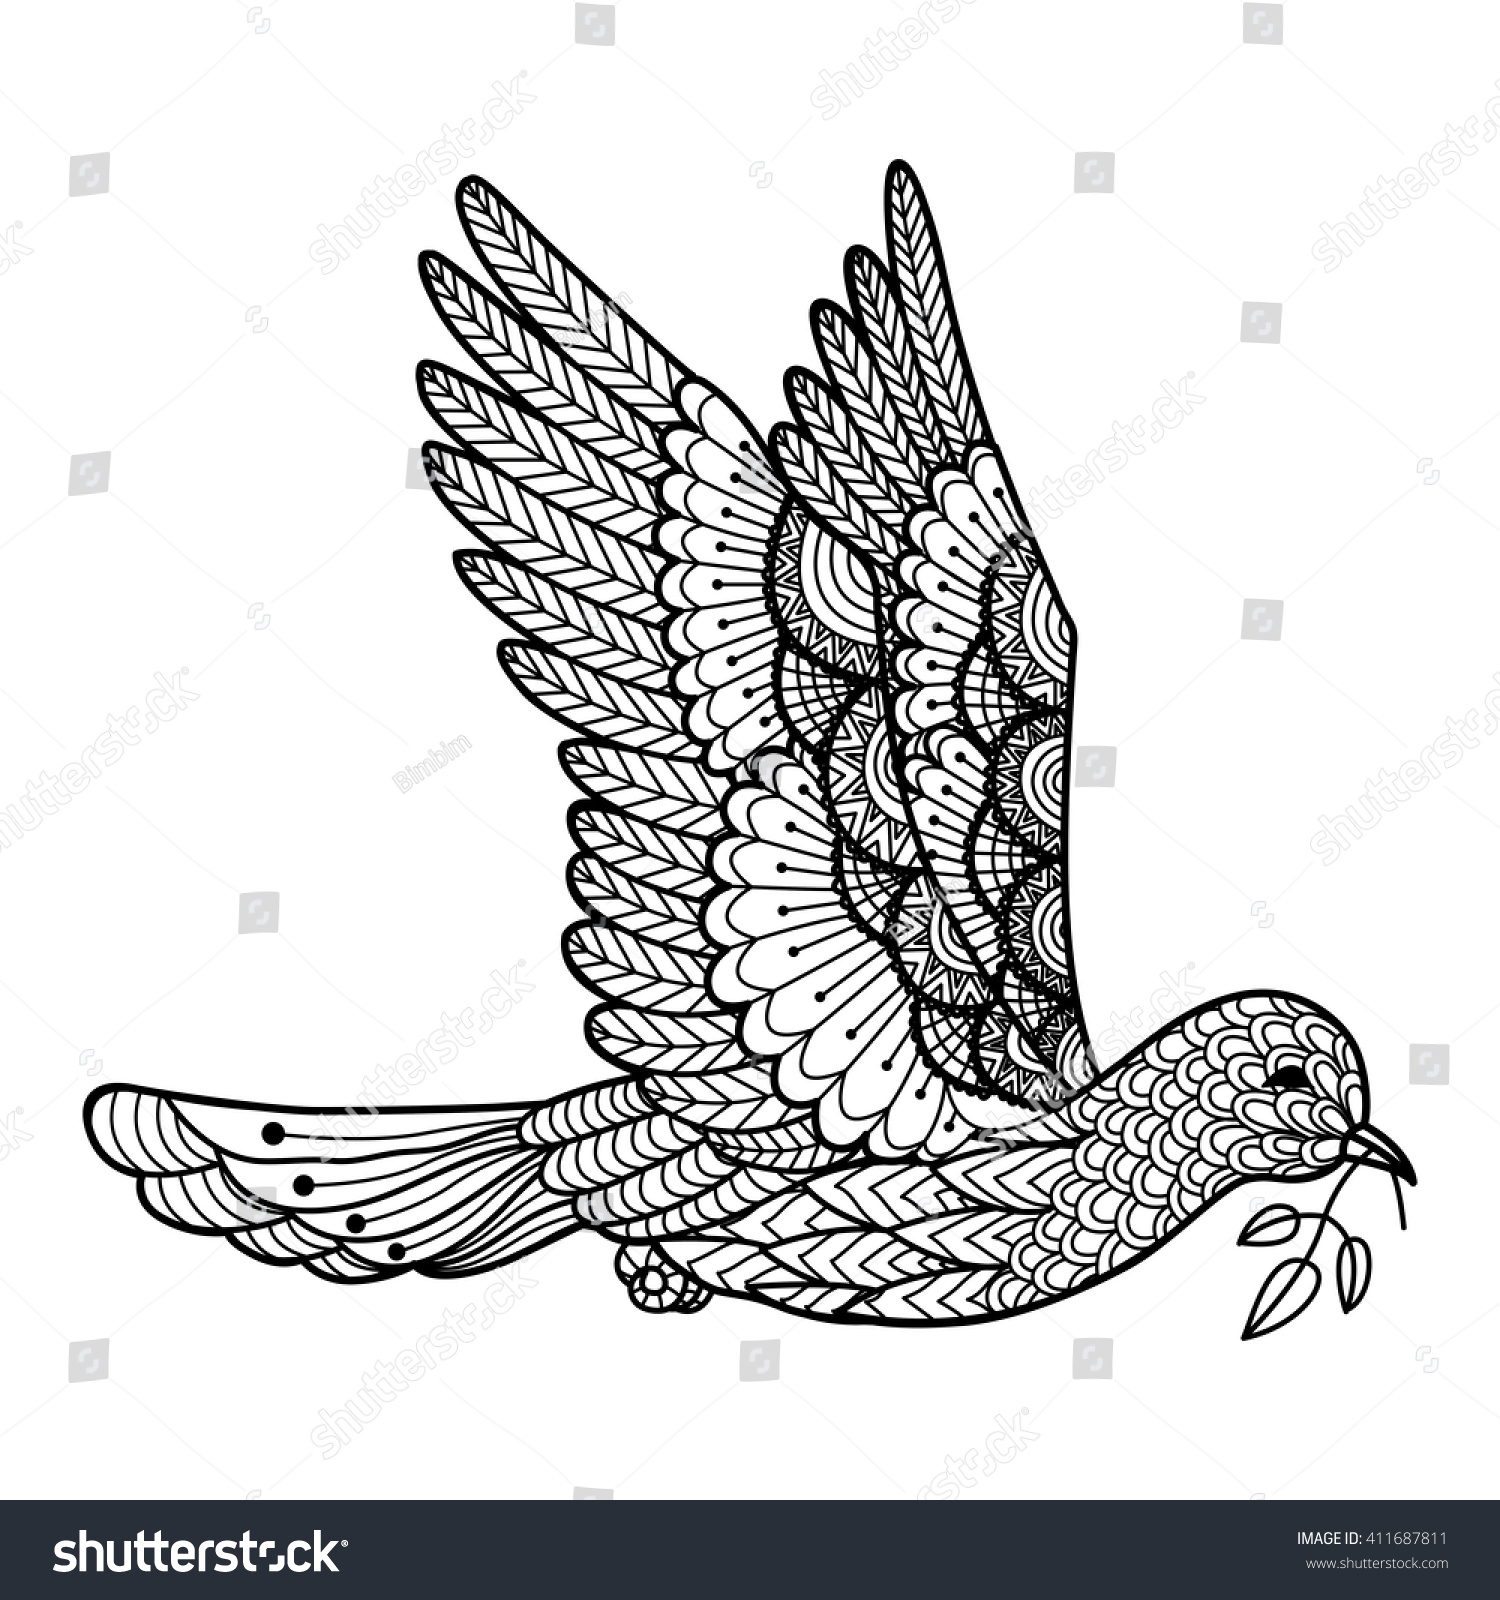 Line Art Leaf : Dove carrying leaves line art design stock vector